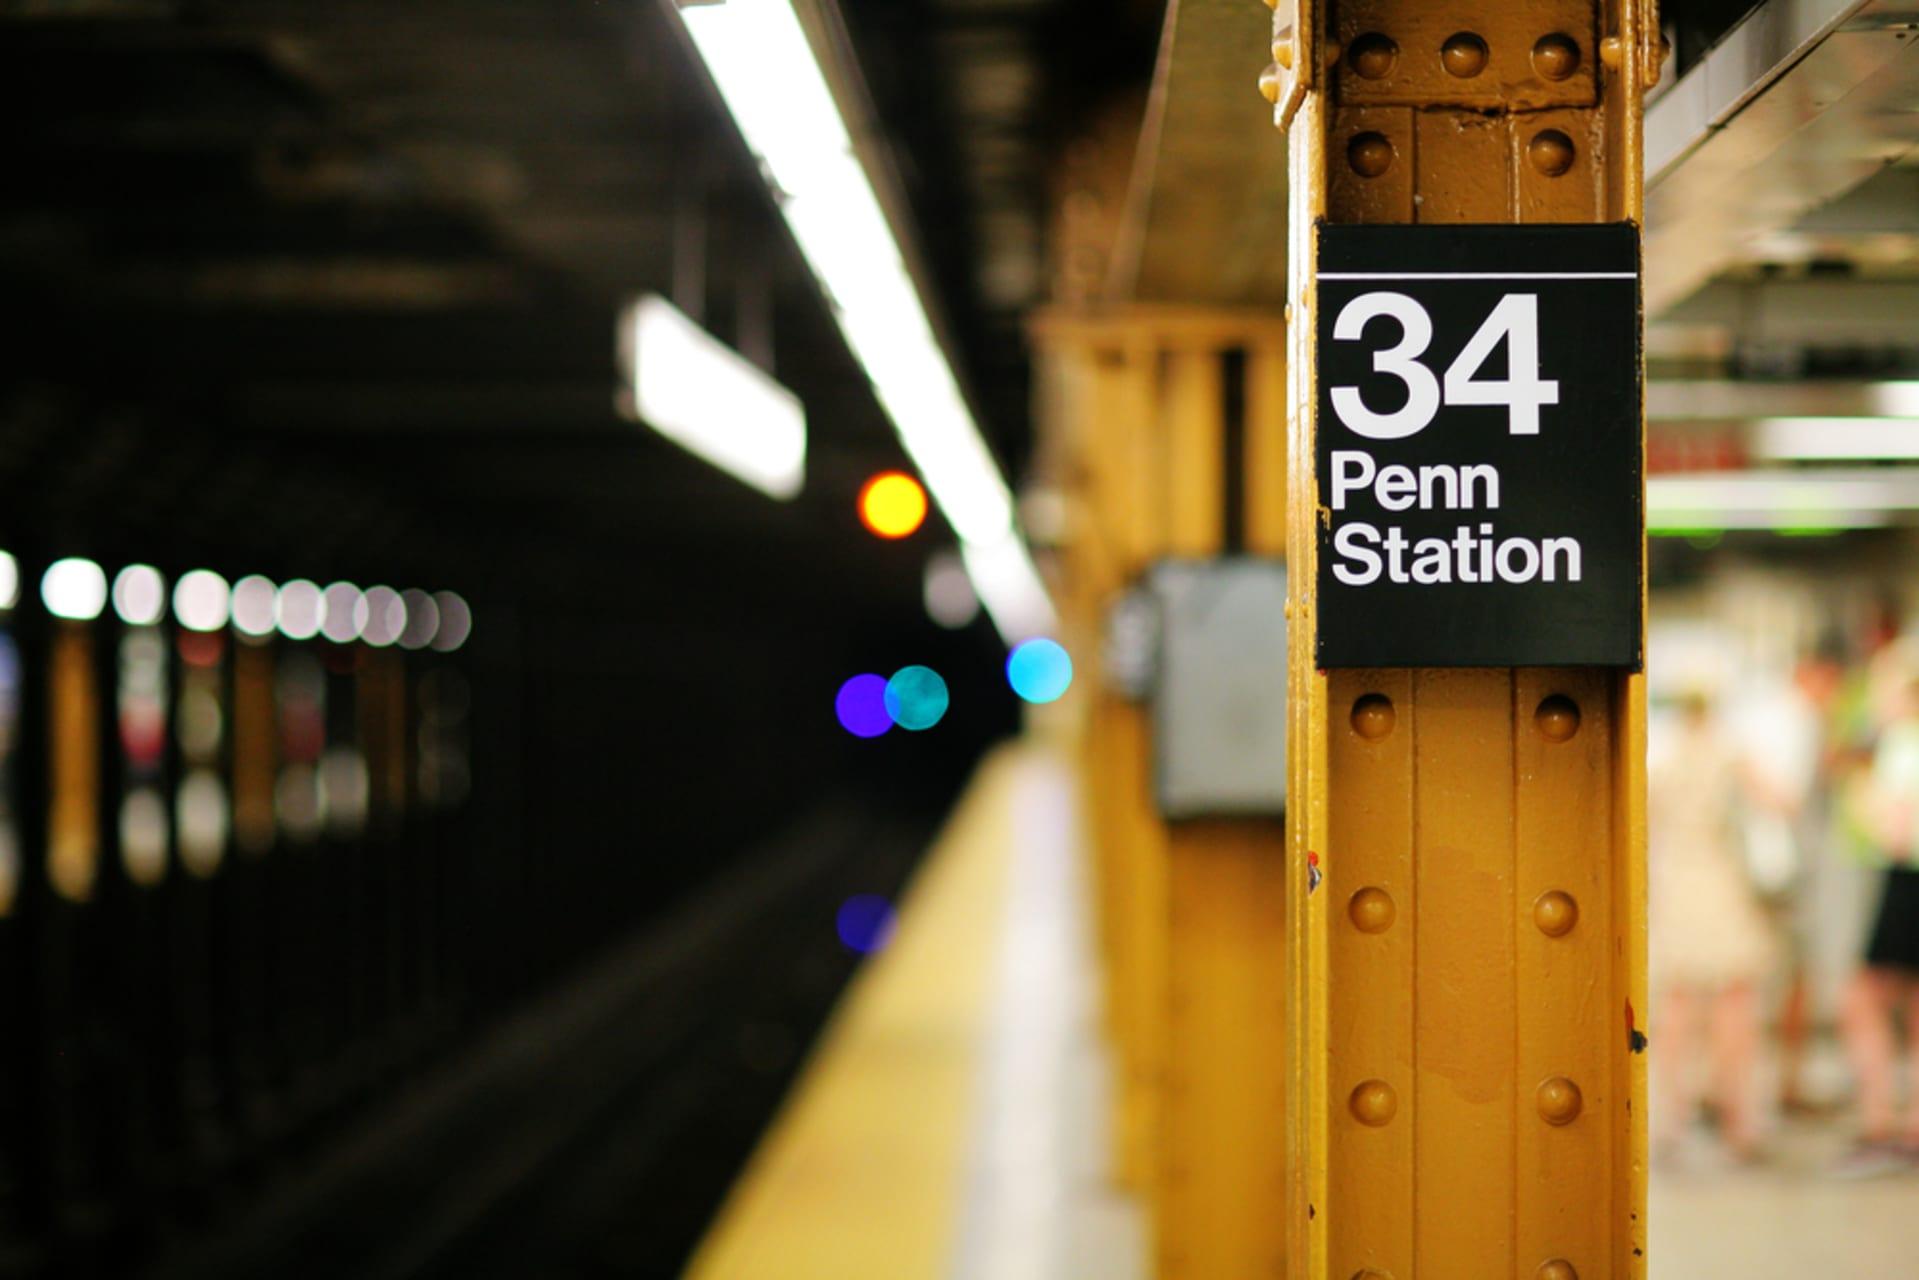 New York - The Journey of Pennsylvania Train Station